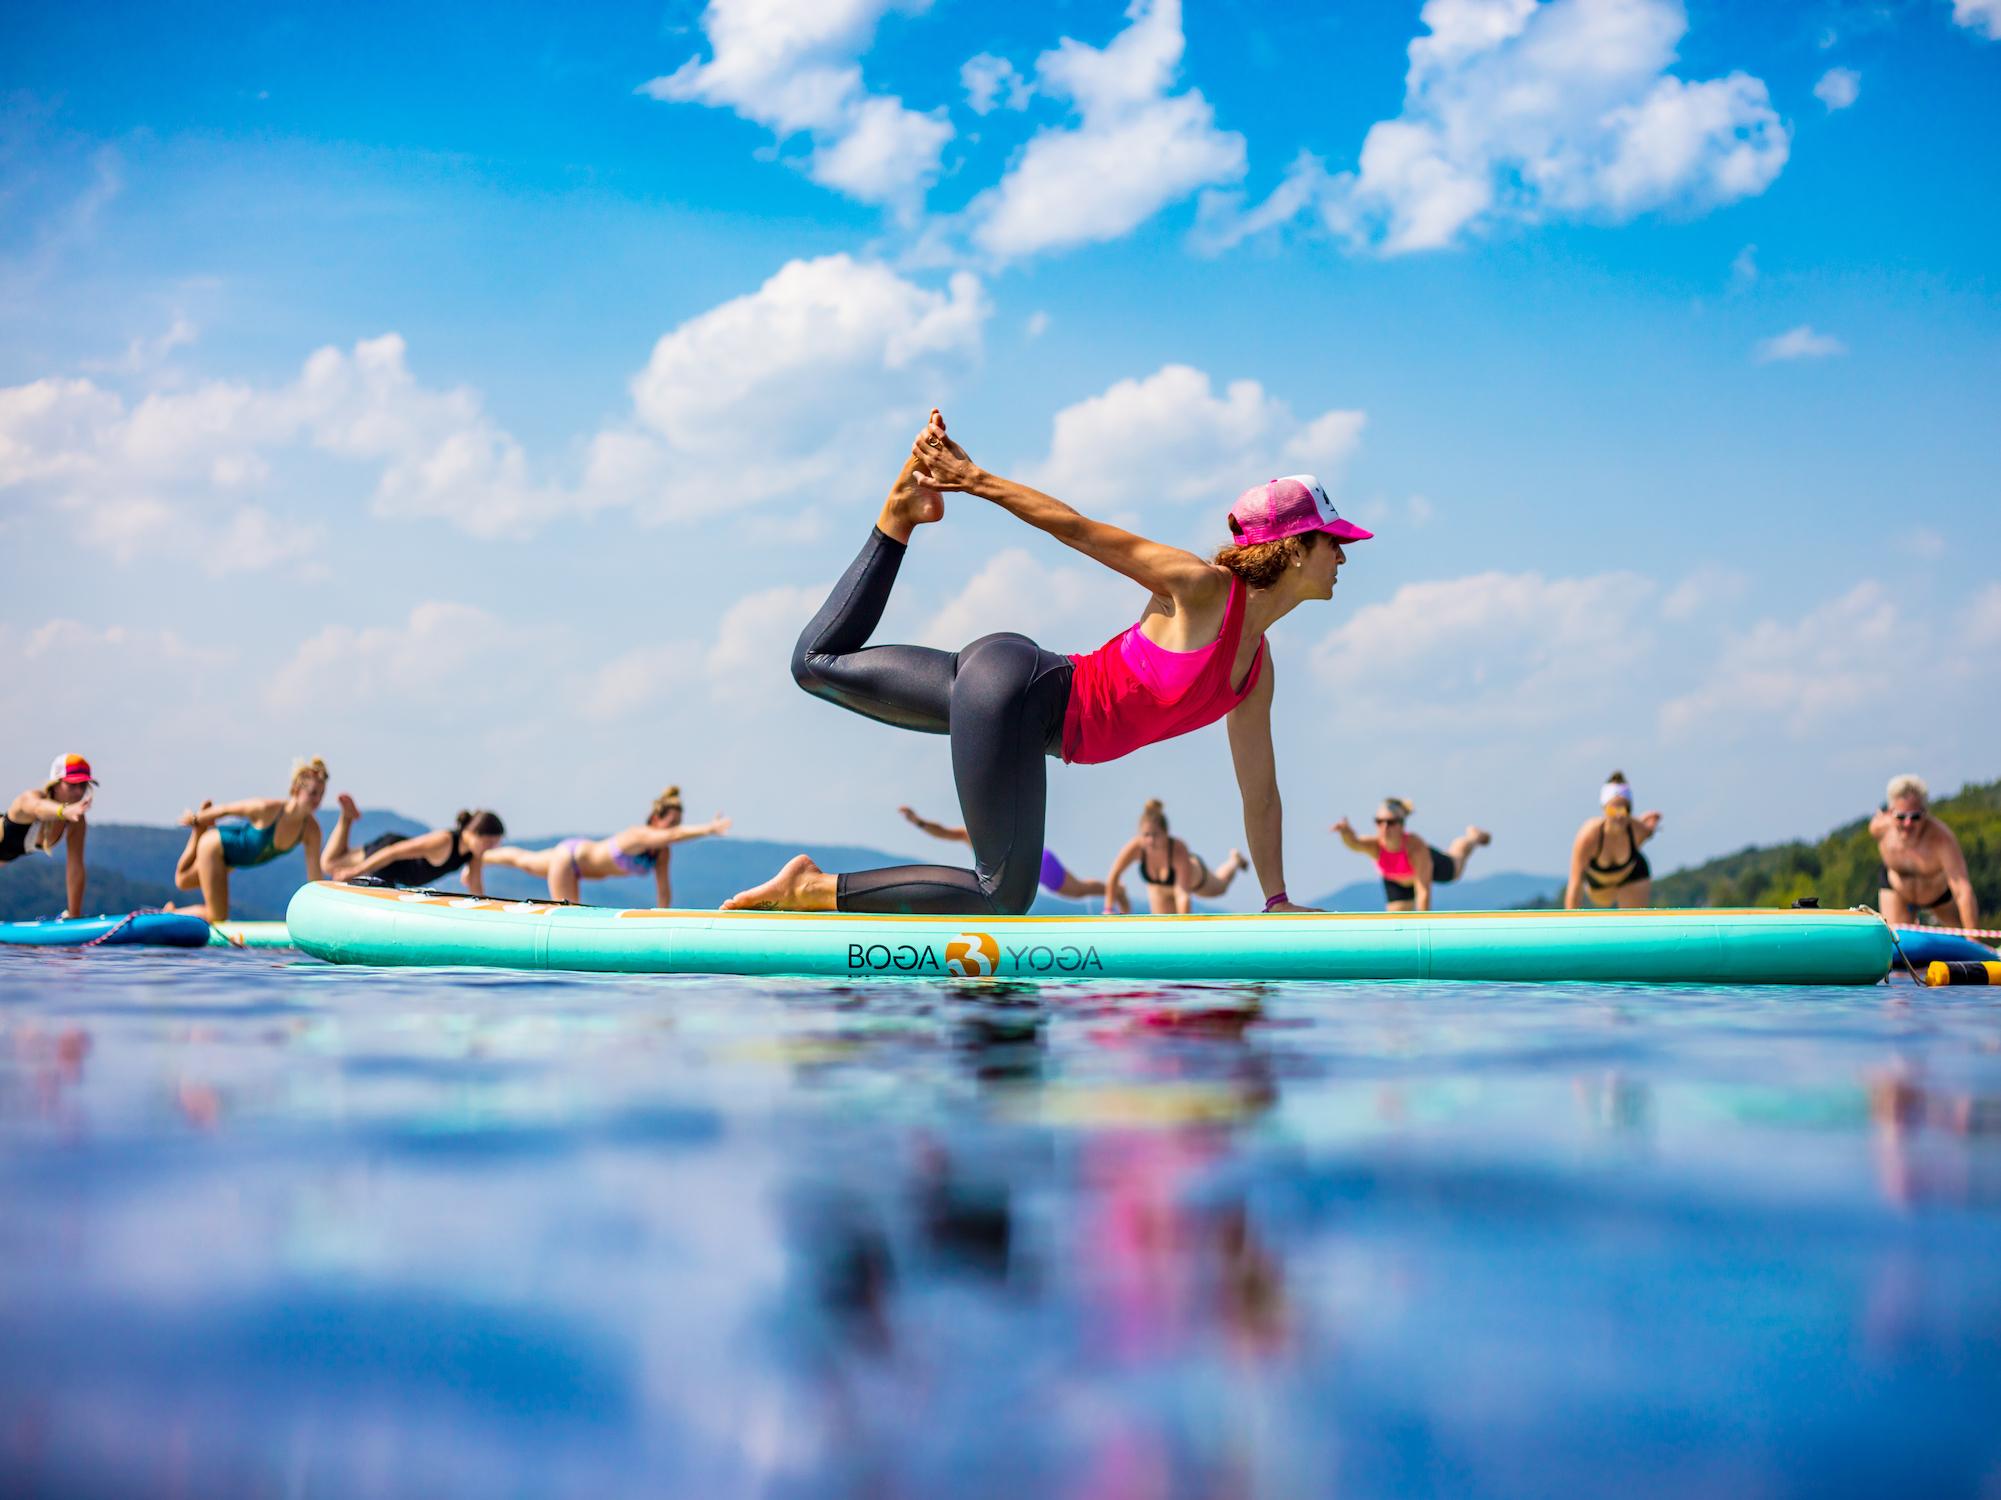 atelier - formation avancée en sup yoga